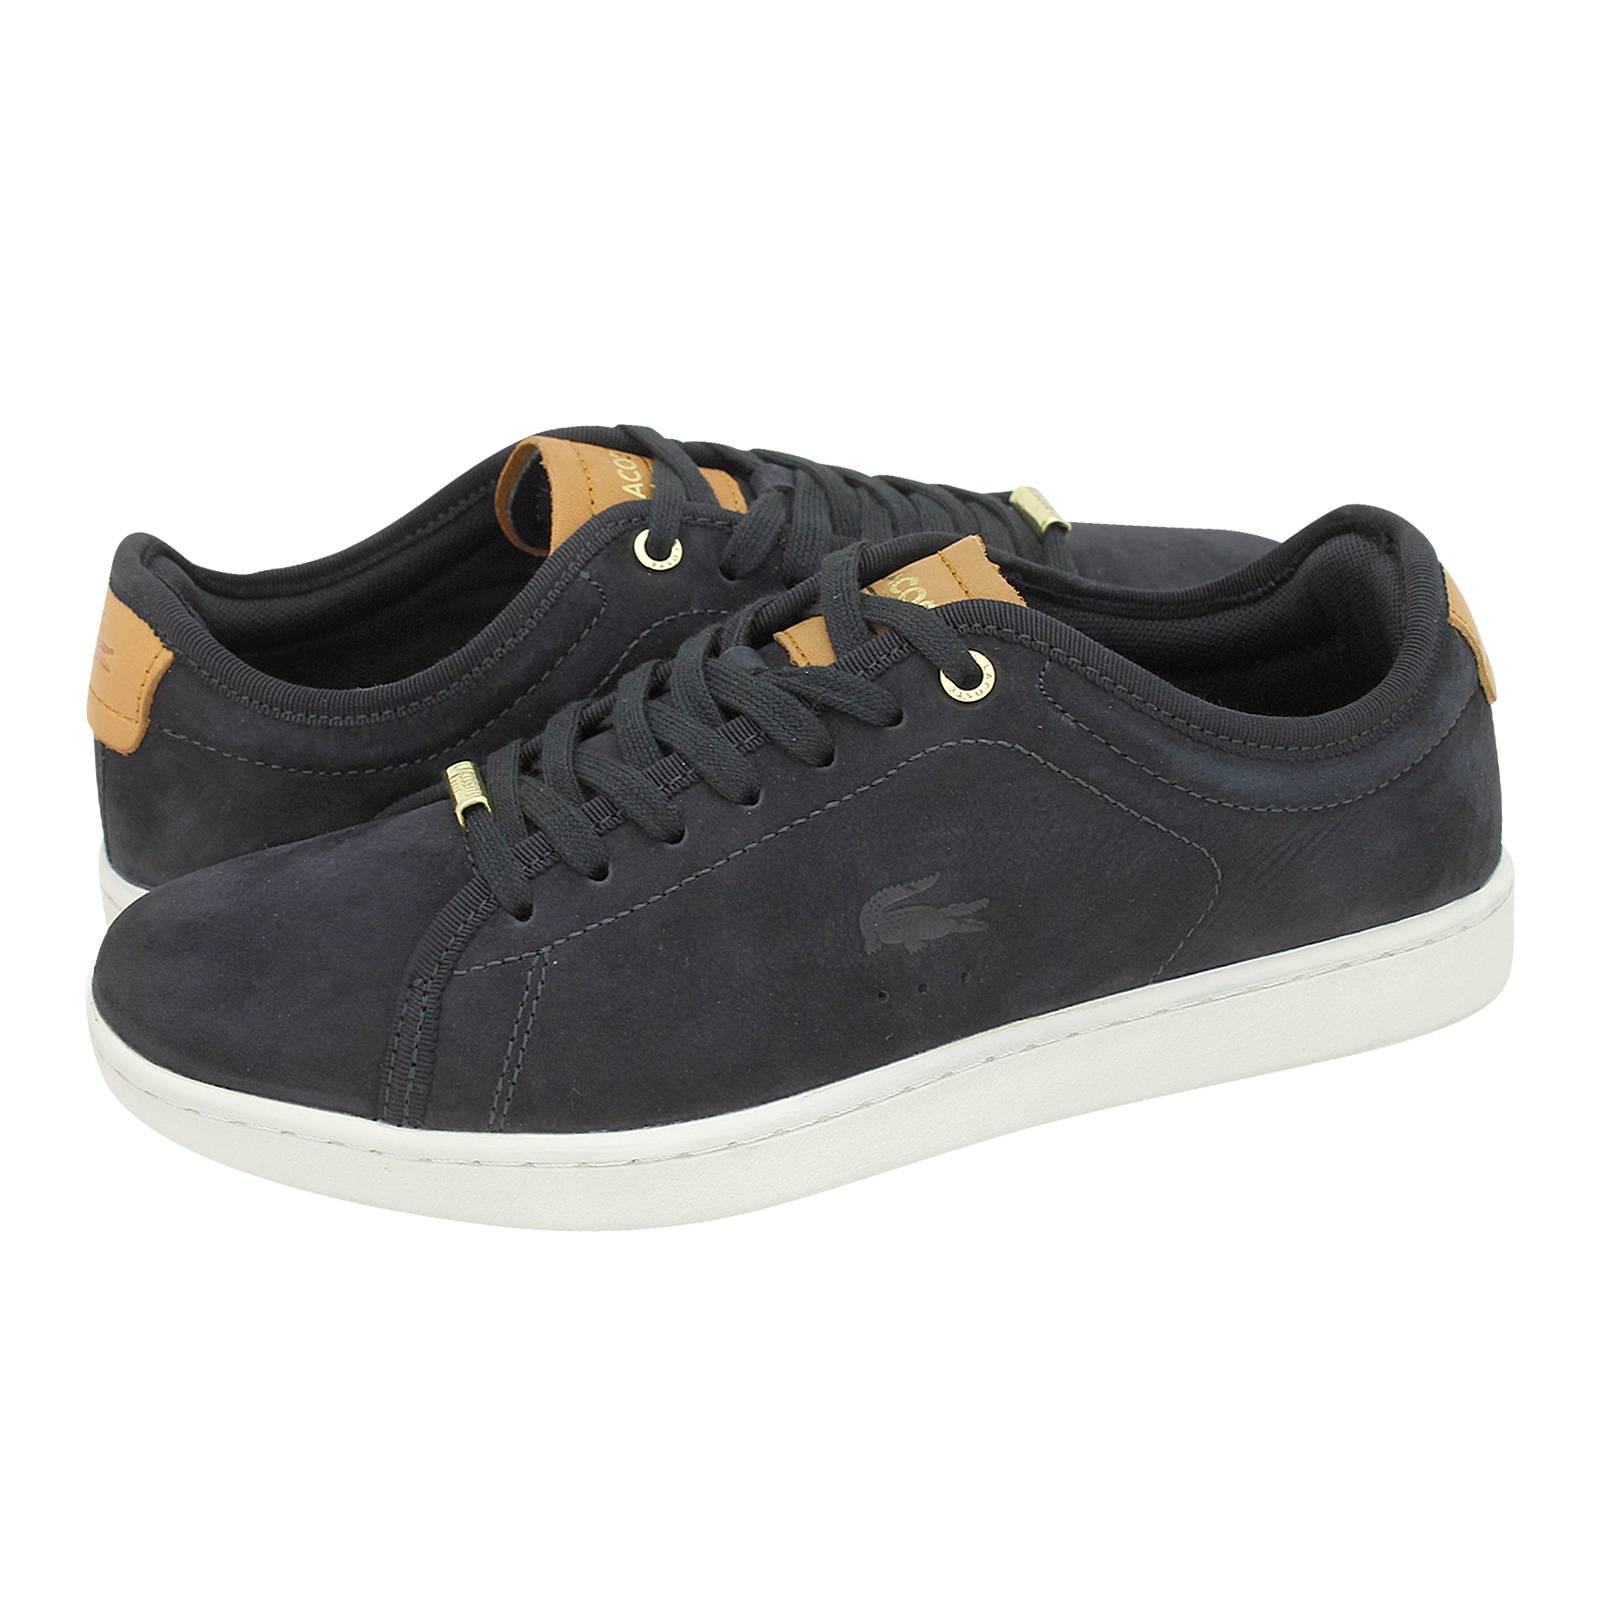 Carnaby Evo 317 - Γυναικεία παπούτσια casual Lacoste από nubuck και ... cccc1b6912e